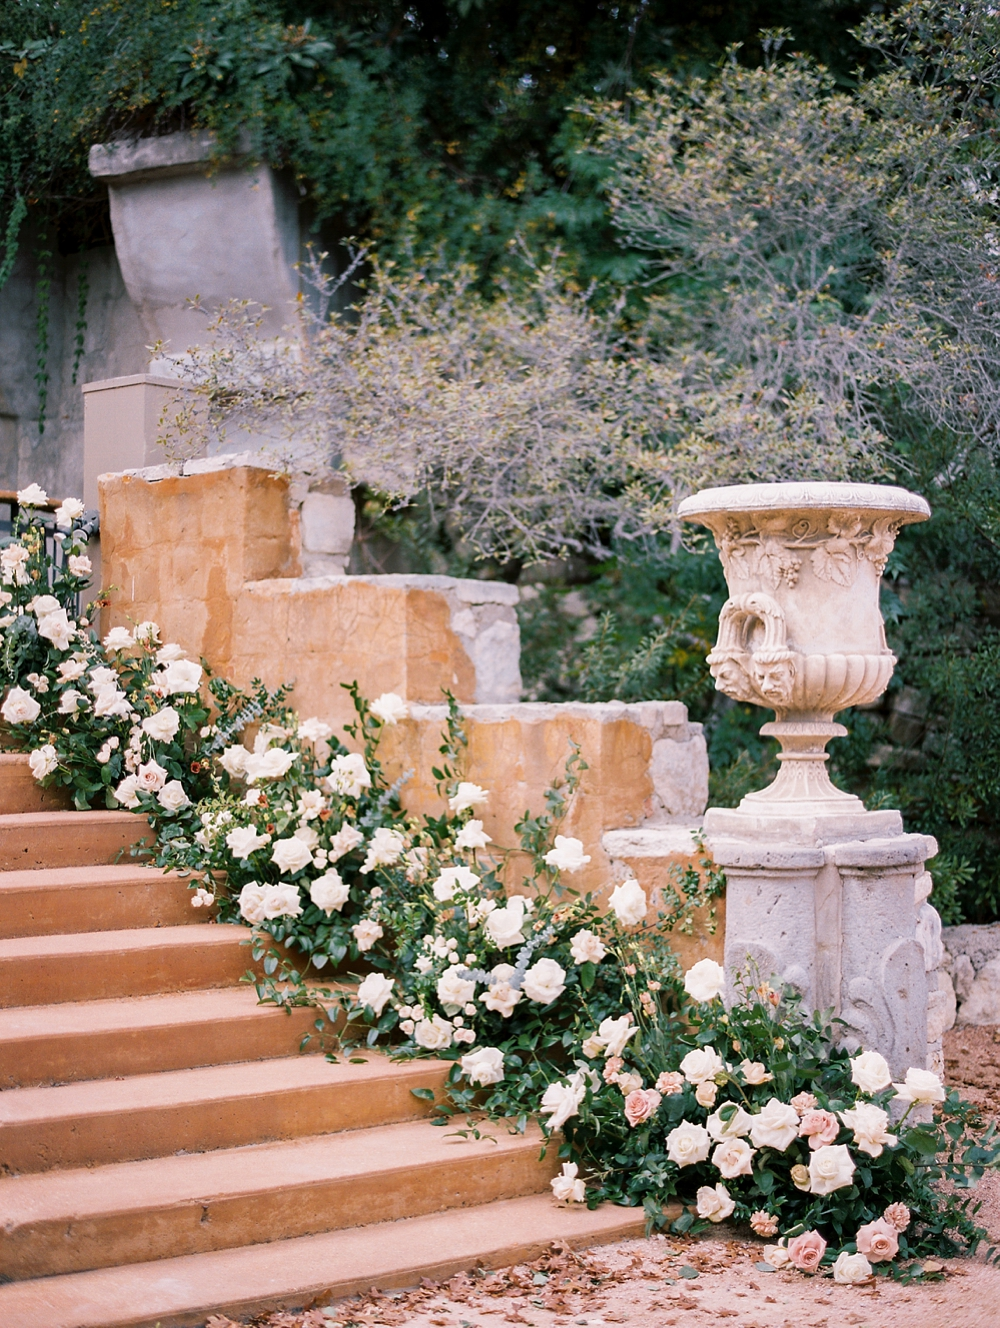 kristin-la-voie-photography-Austin-Wedding-Photographer-Villa-Antonia-215